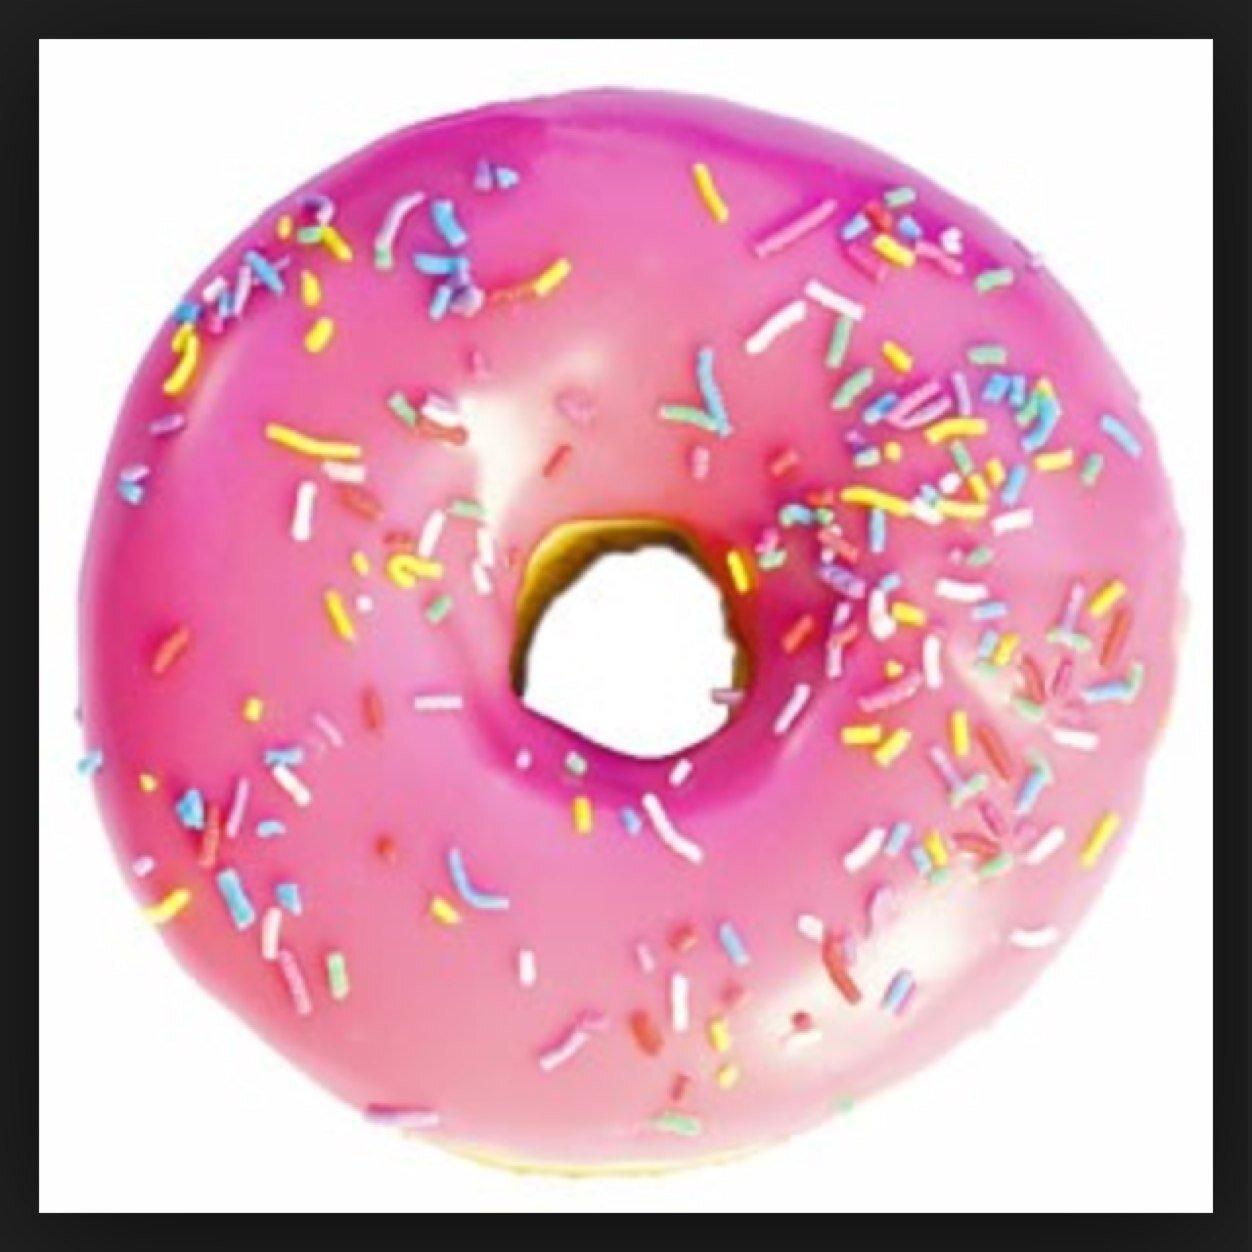 Doughnut (@thelildoughnut)